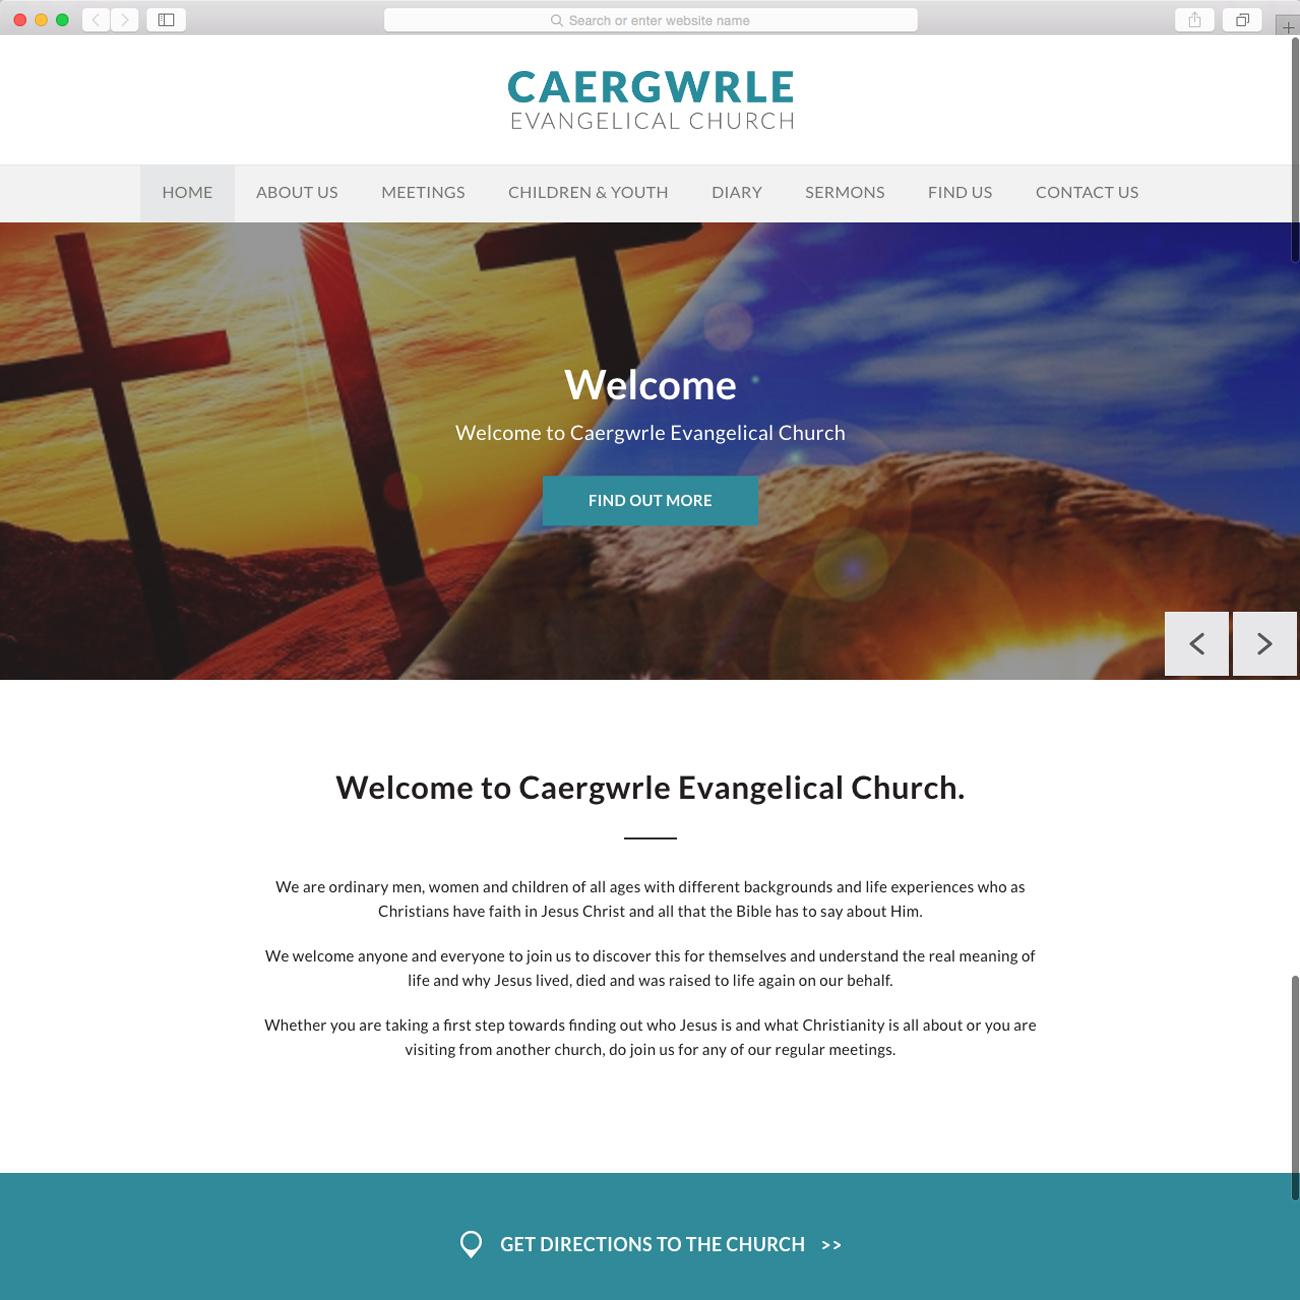 Caergwrle Evangelical Church